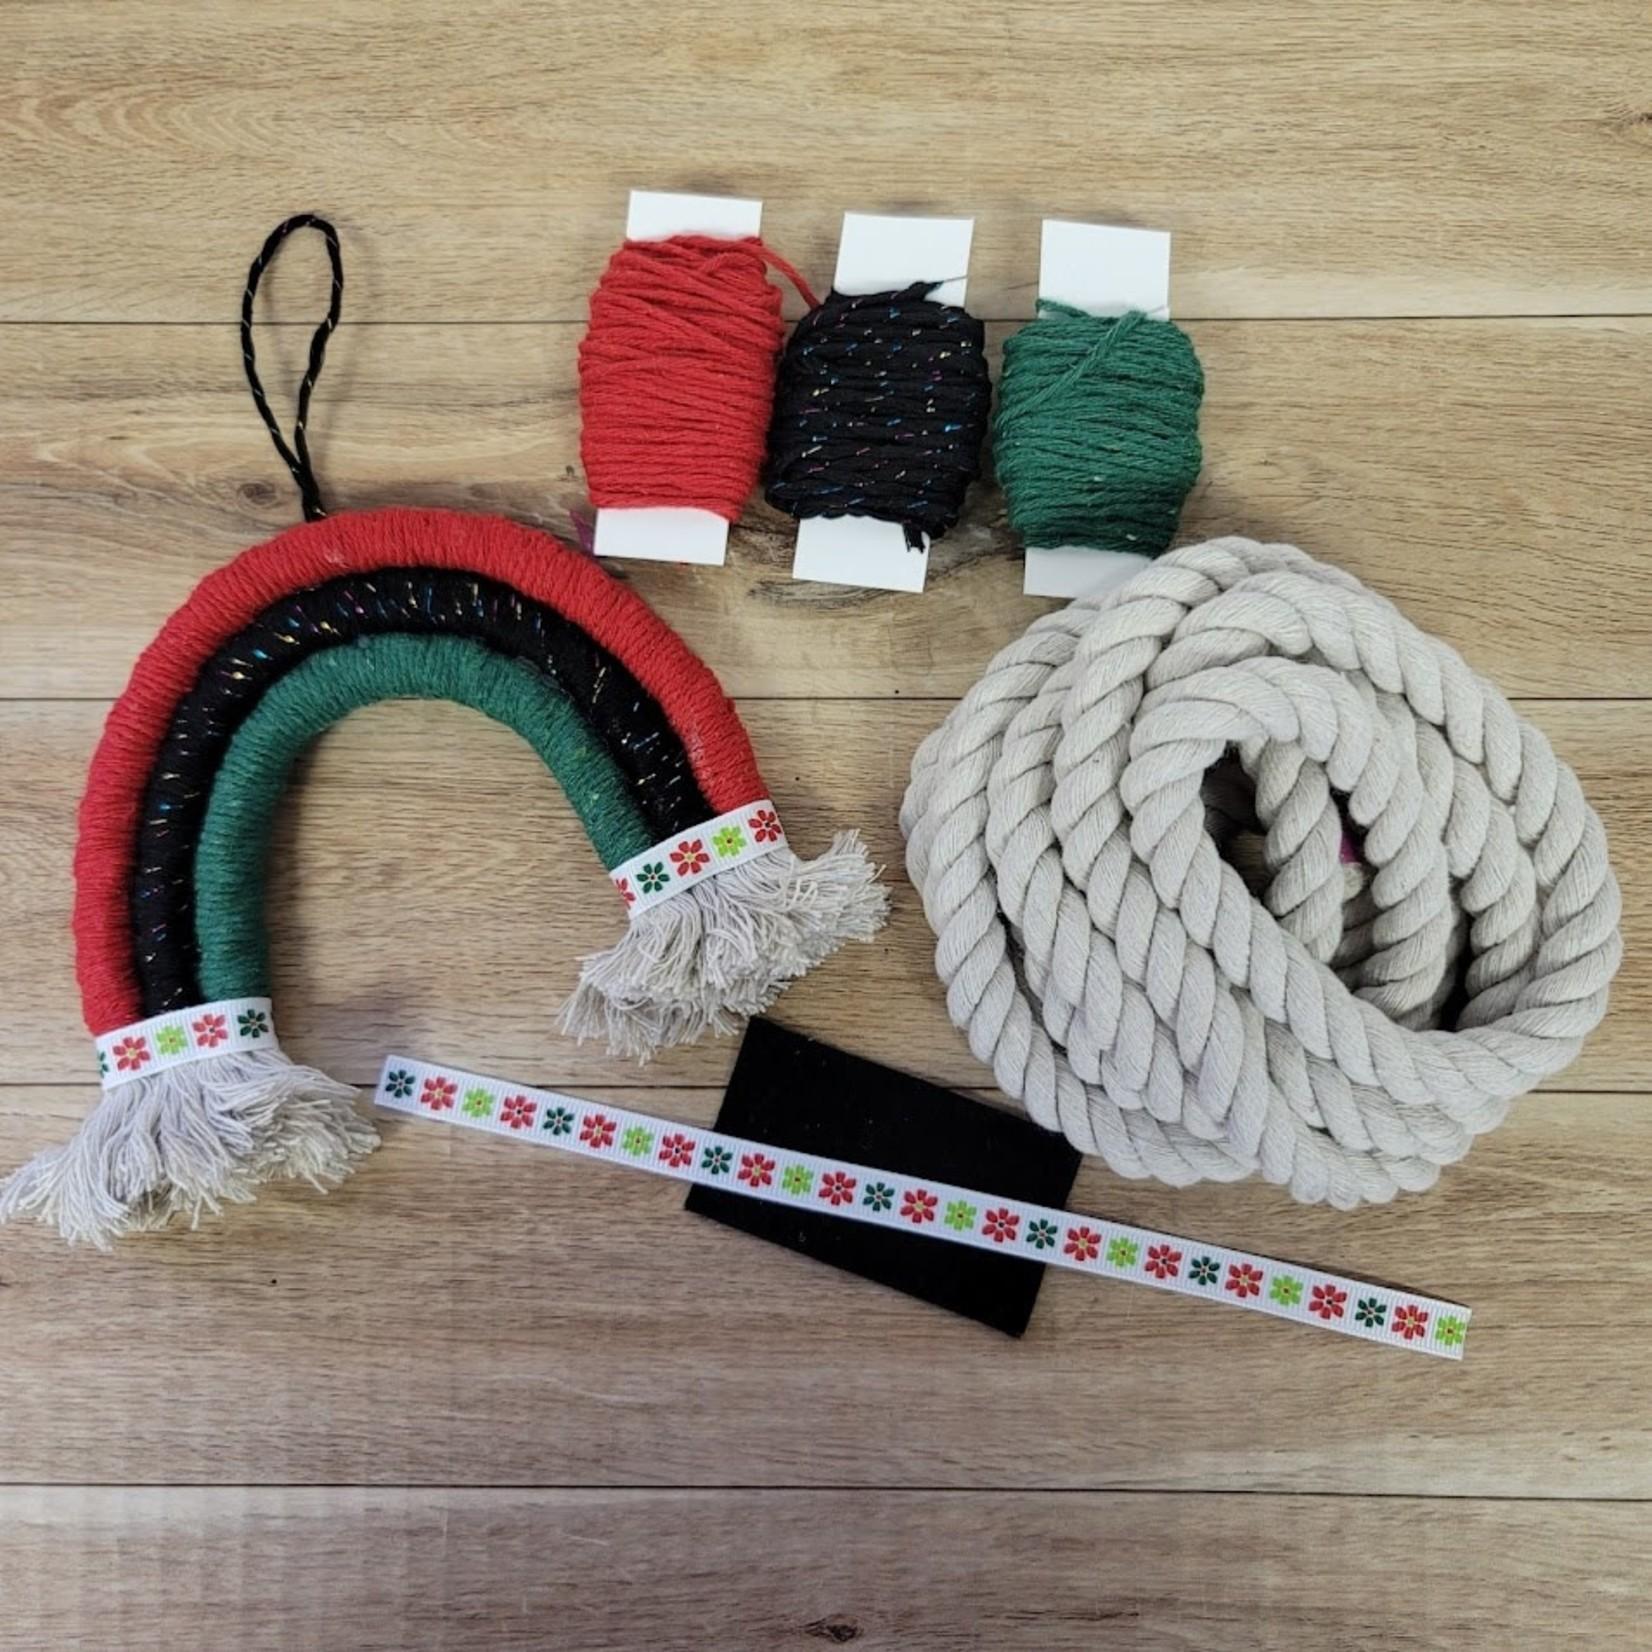 DIY Small Rainbow Kit (Macrame, Yarn Wrapping)